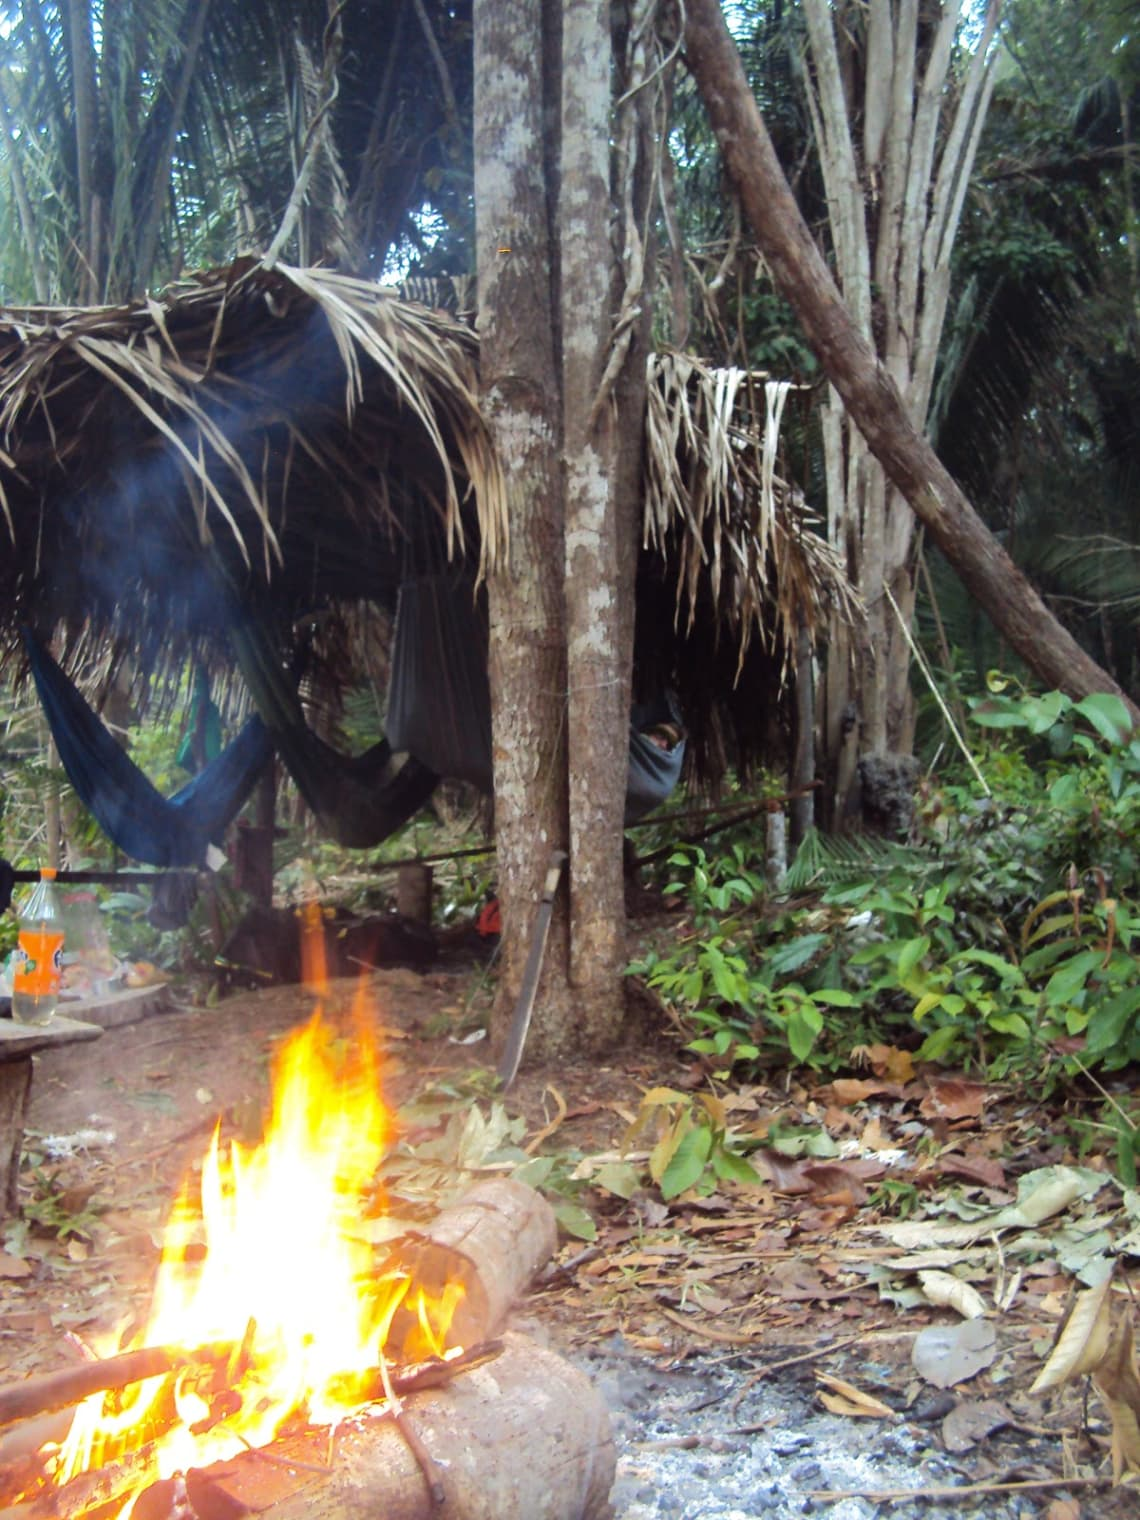 Floresta Amazônica, município de Itacoatiara, Amazonas